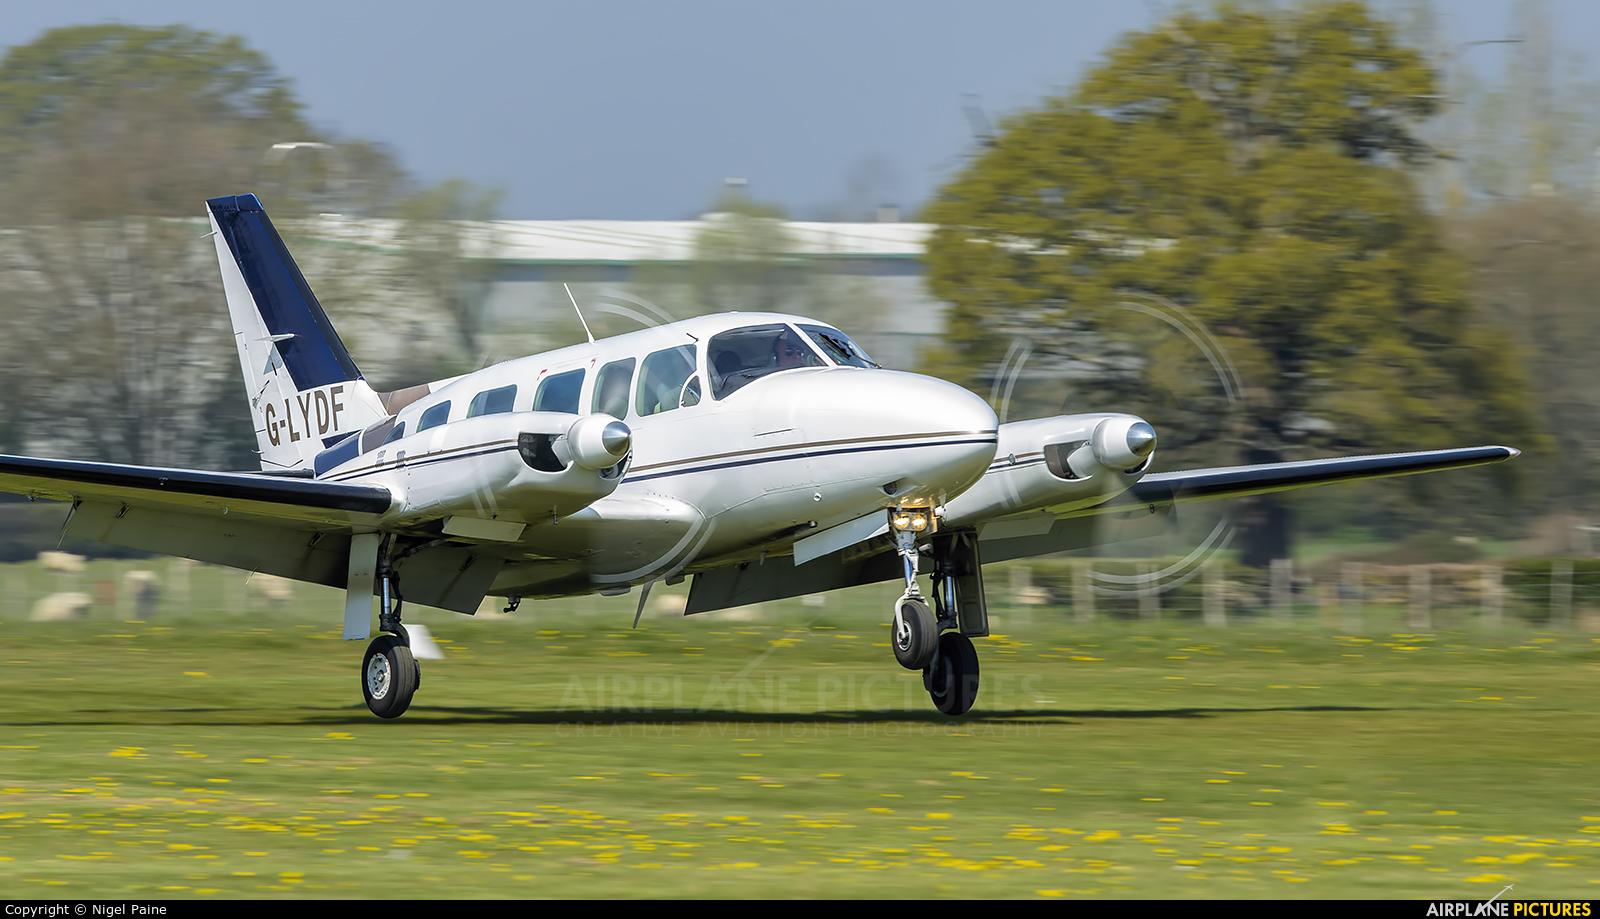 Private G-LYDF aircraft at Lashenden / Headcorn